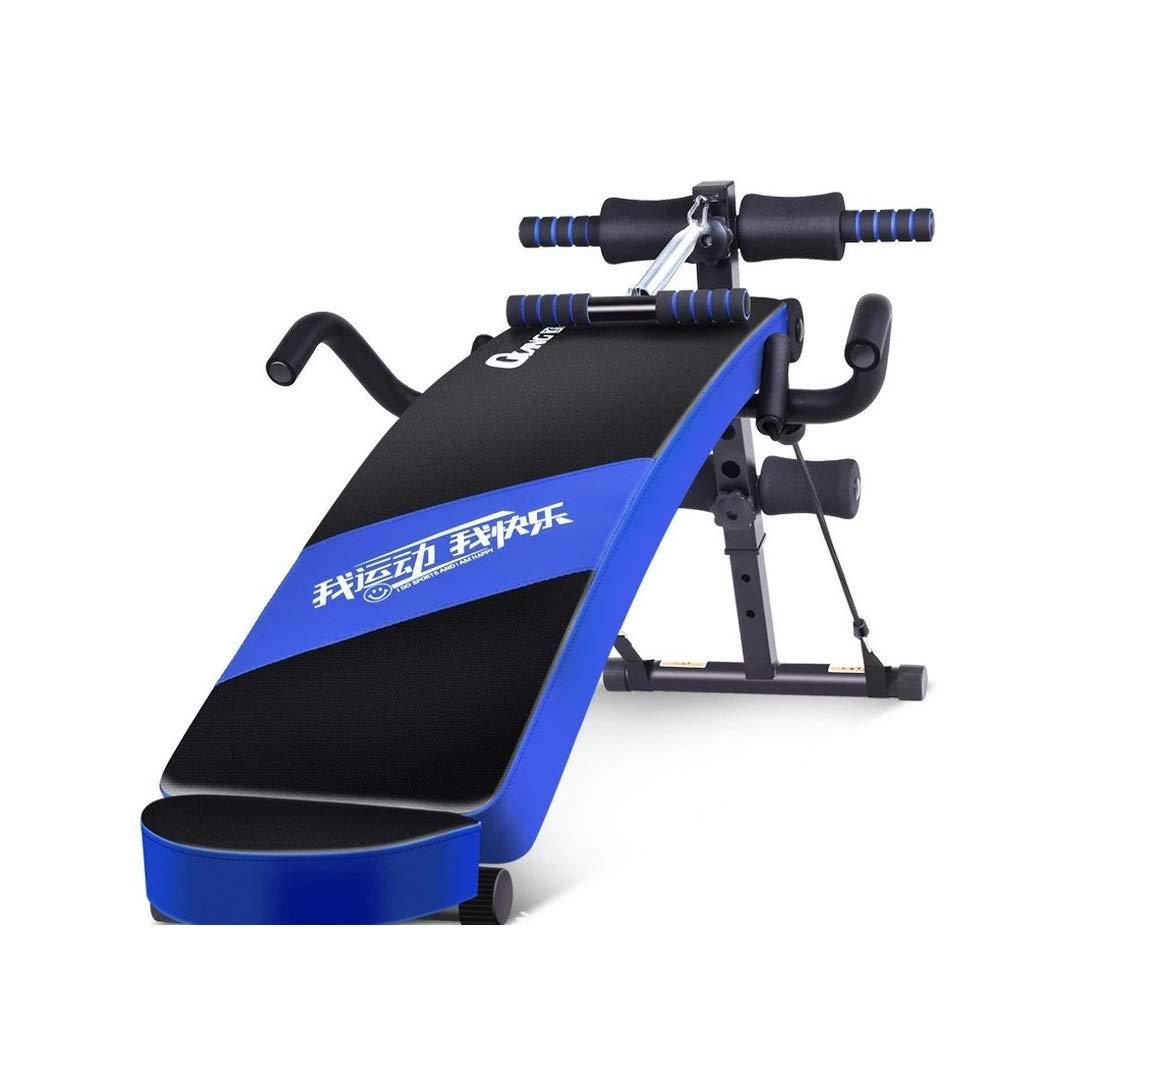 Chaopeng 腹筋ボード多機能腹部ボード家庭用フィットネス機器腹部腹部マシン腹部デバイス   B07QR5JBHV